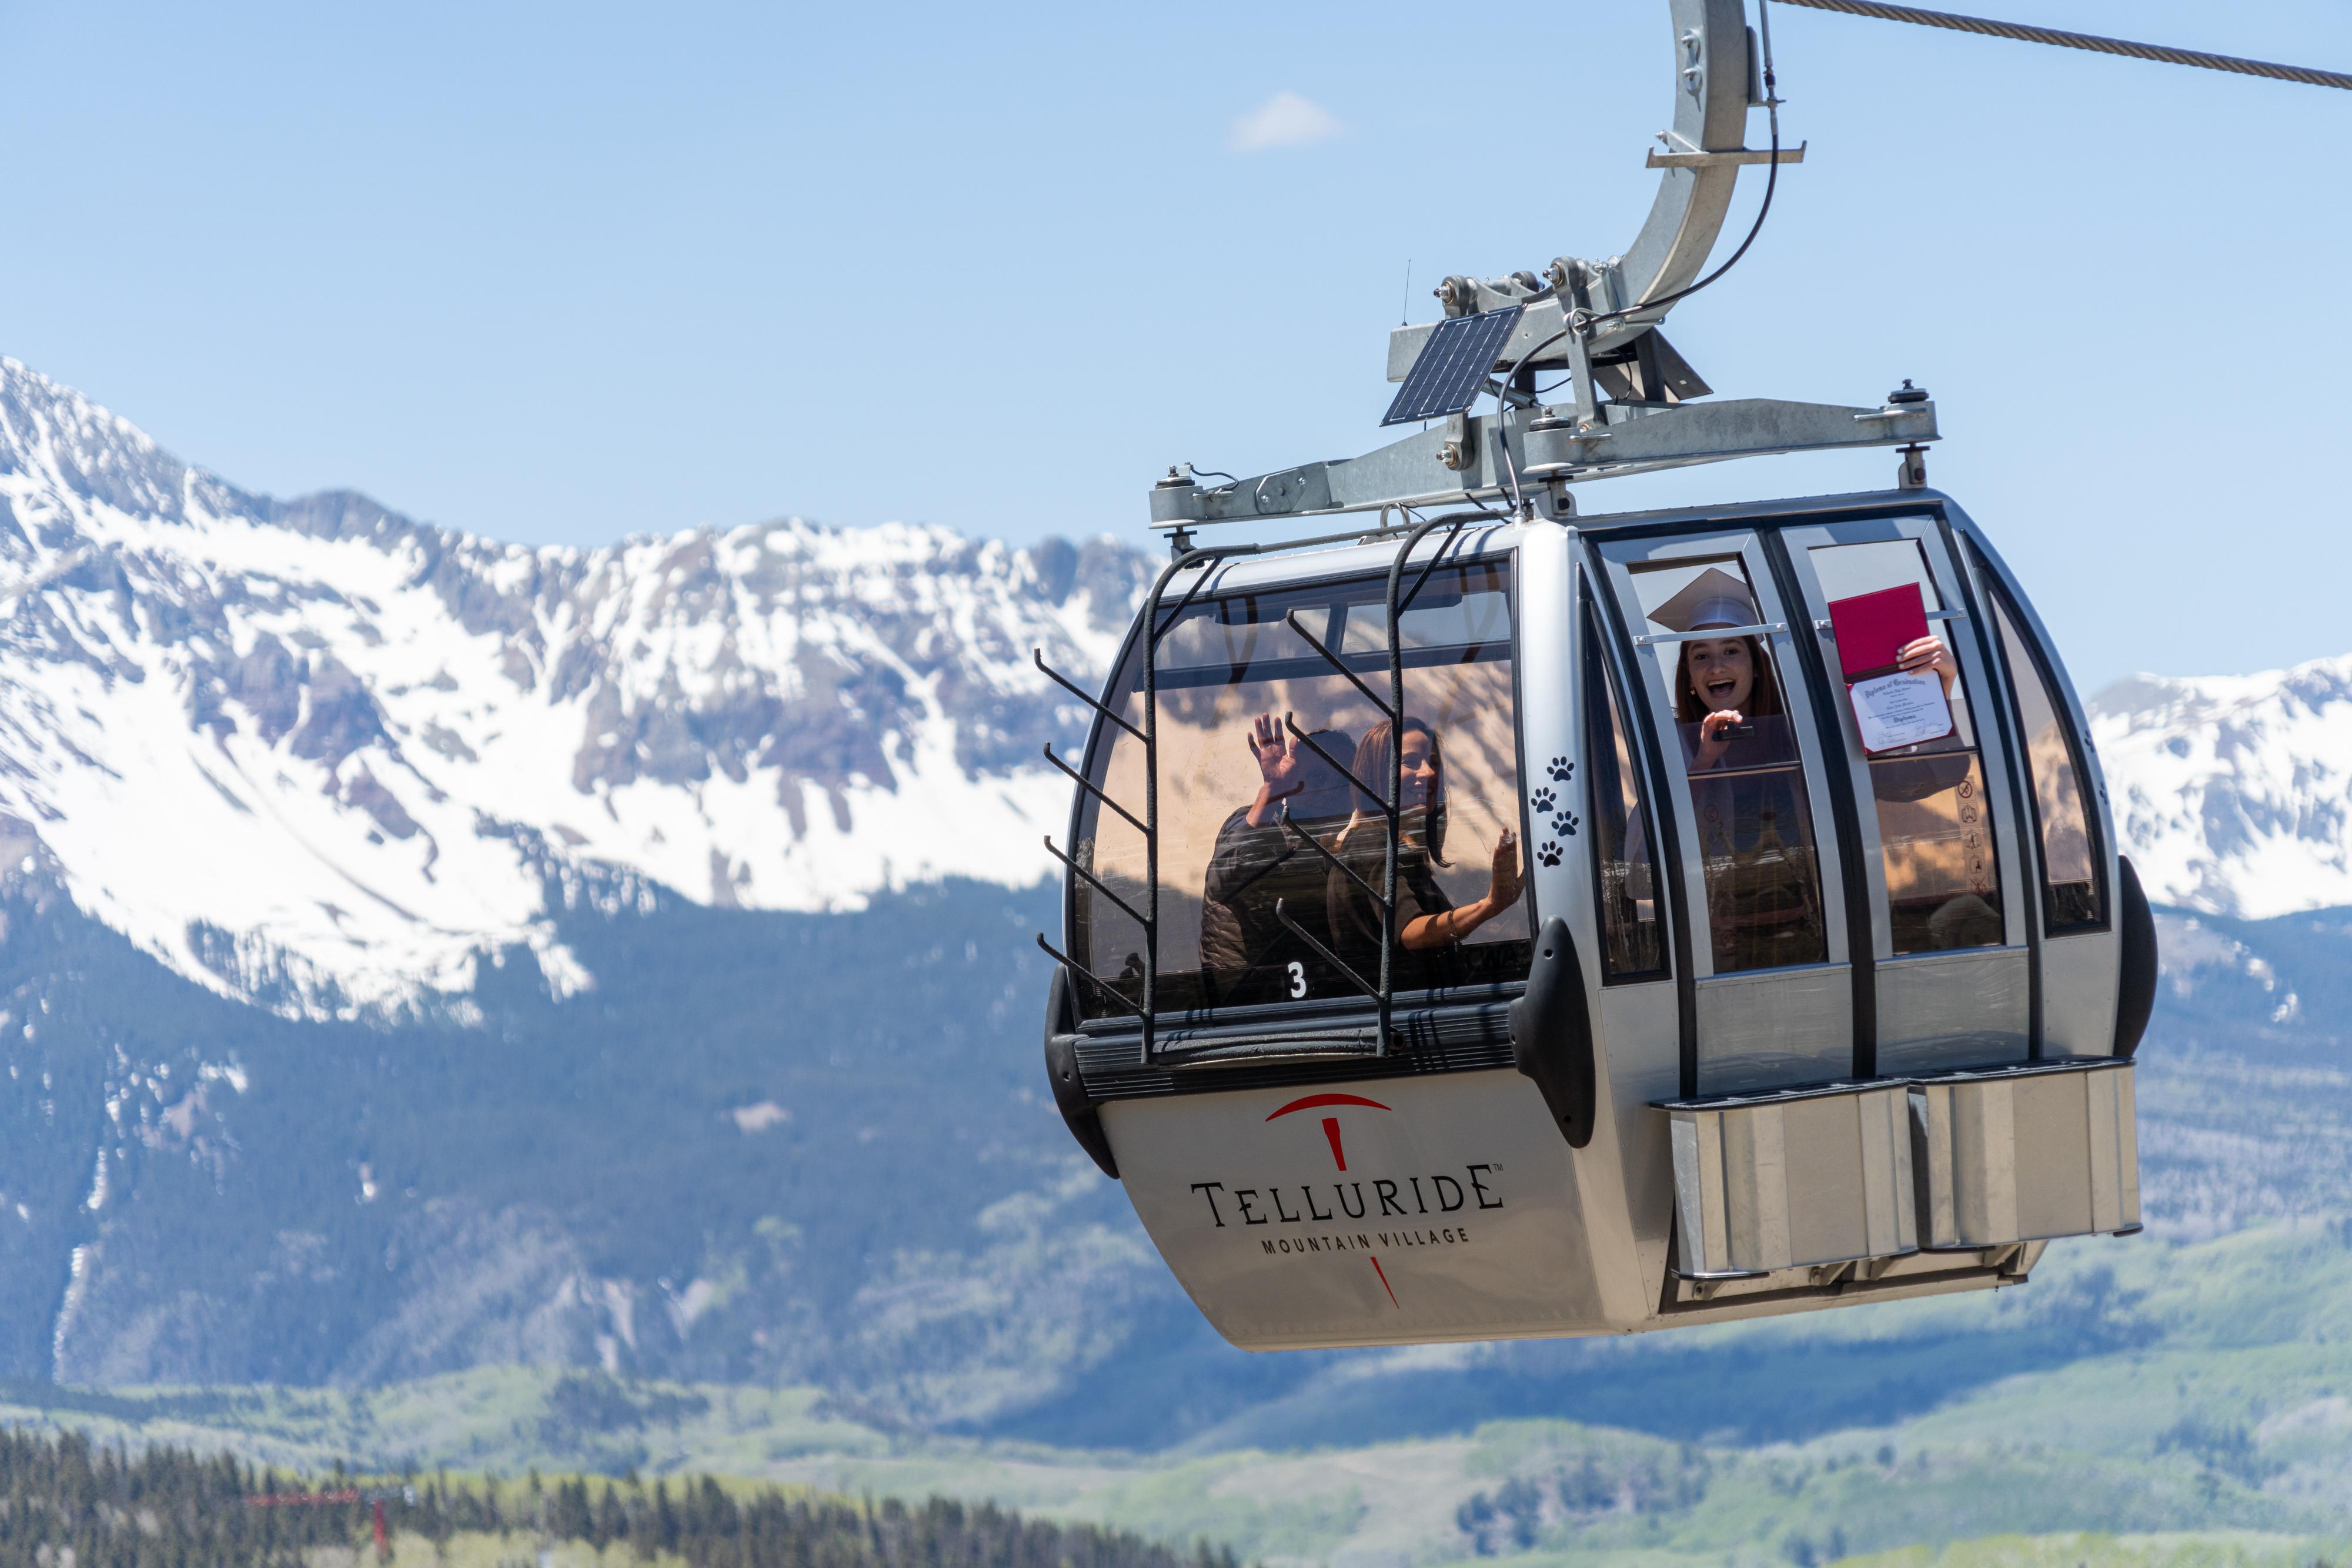 Telluride High School seniors took gondolas to pick up their diplomas.